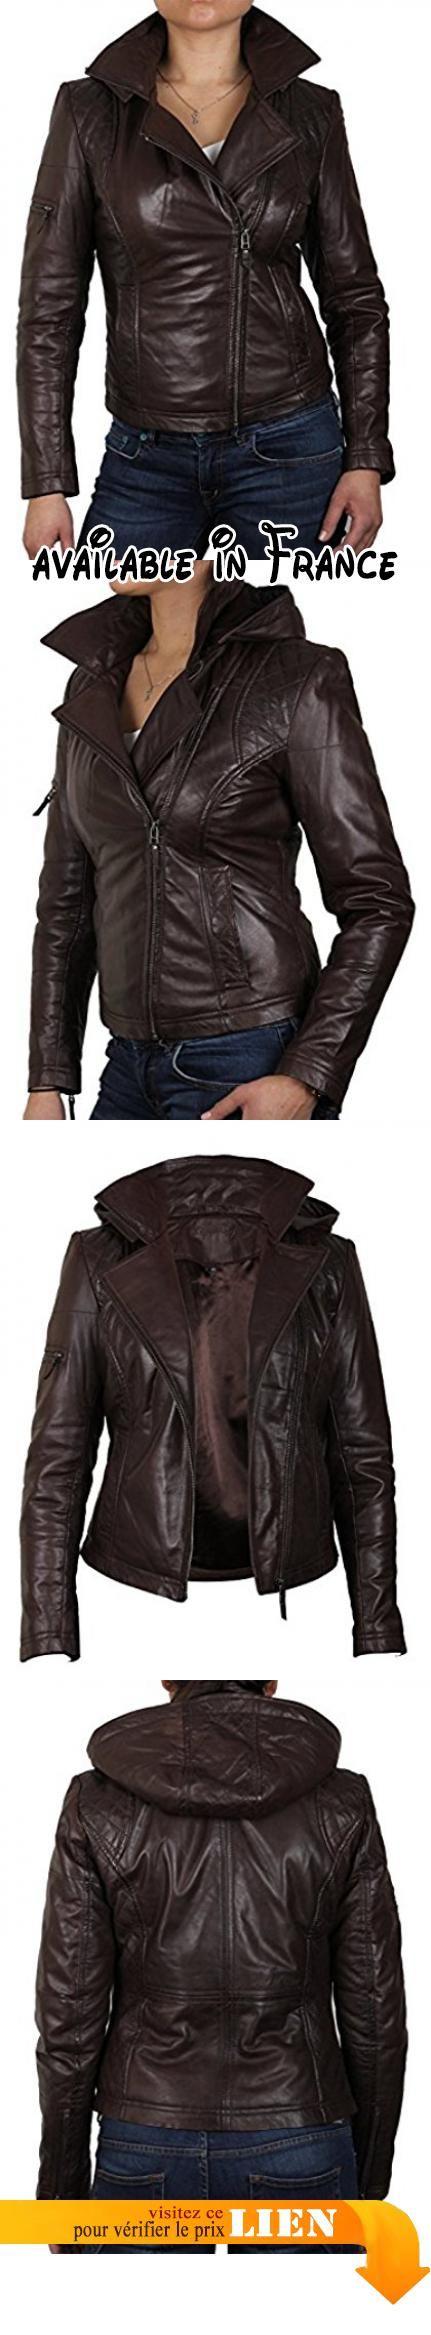 de con para marrón mujer Zztqft estilo cuero chaqueta capucha biker Diseño rdsQht